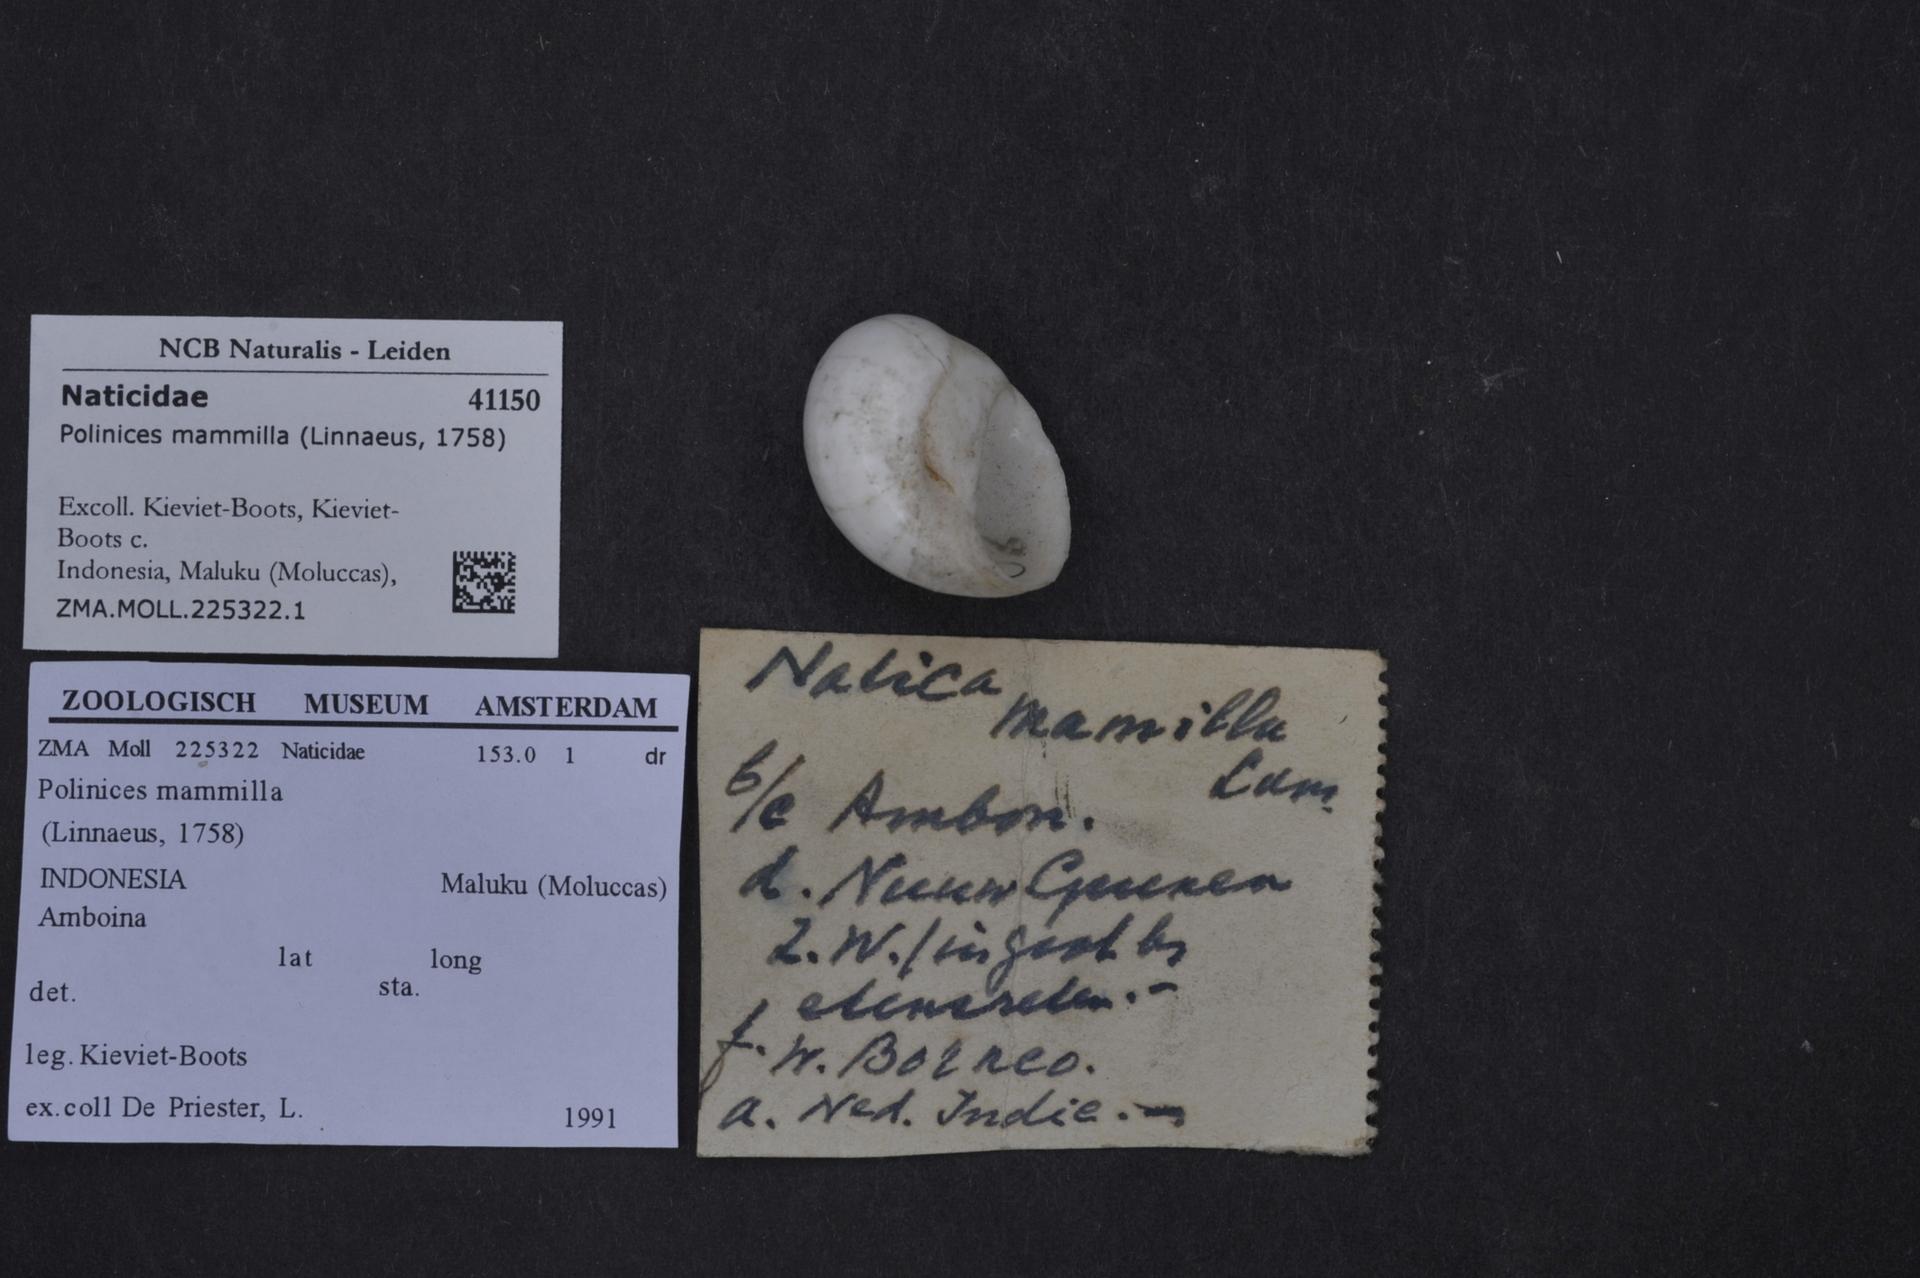 ZMA.MOLL.225322.1 | Polinices mammilla (Linnaeus, 1758)